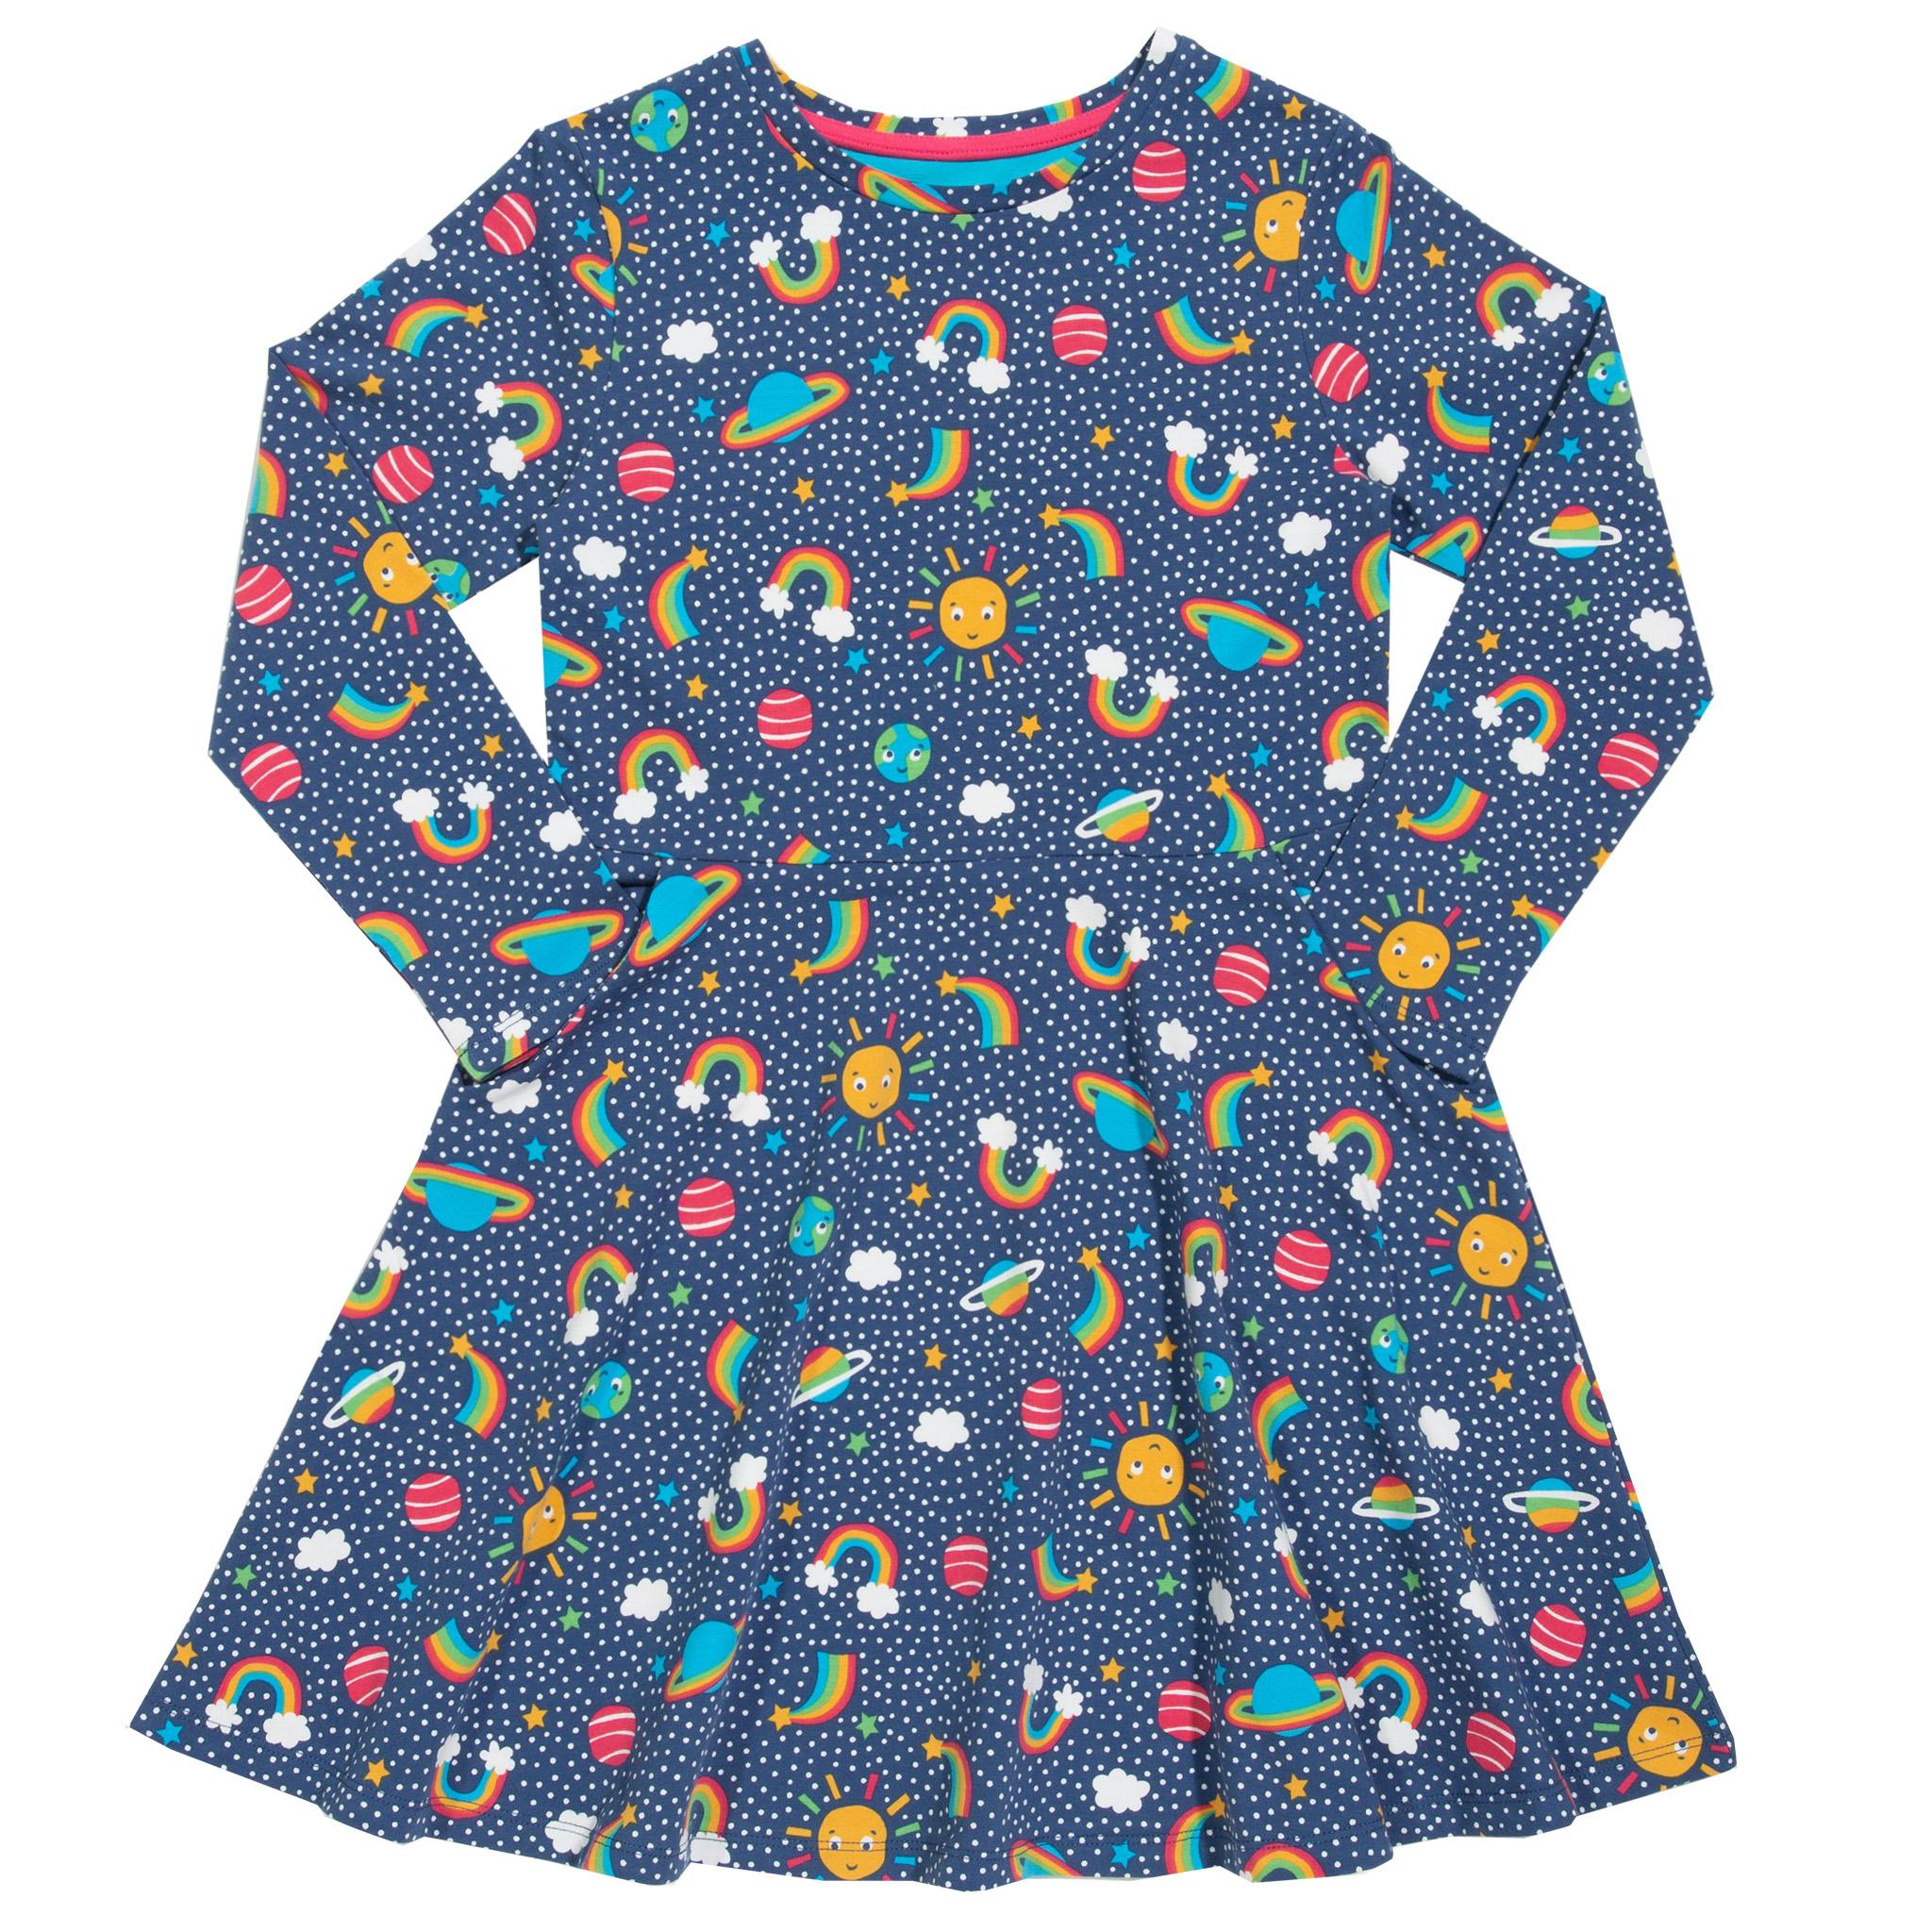 Kite Stellar Skater Dress